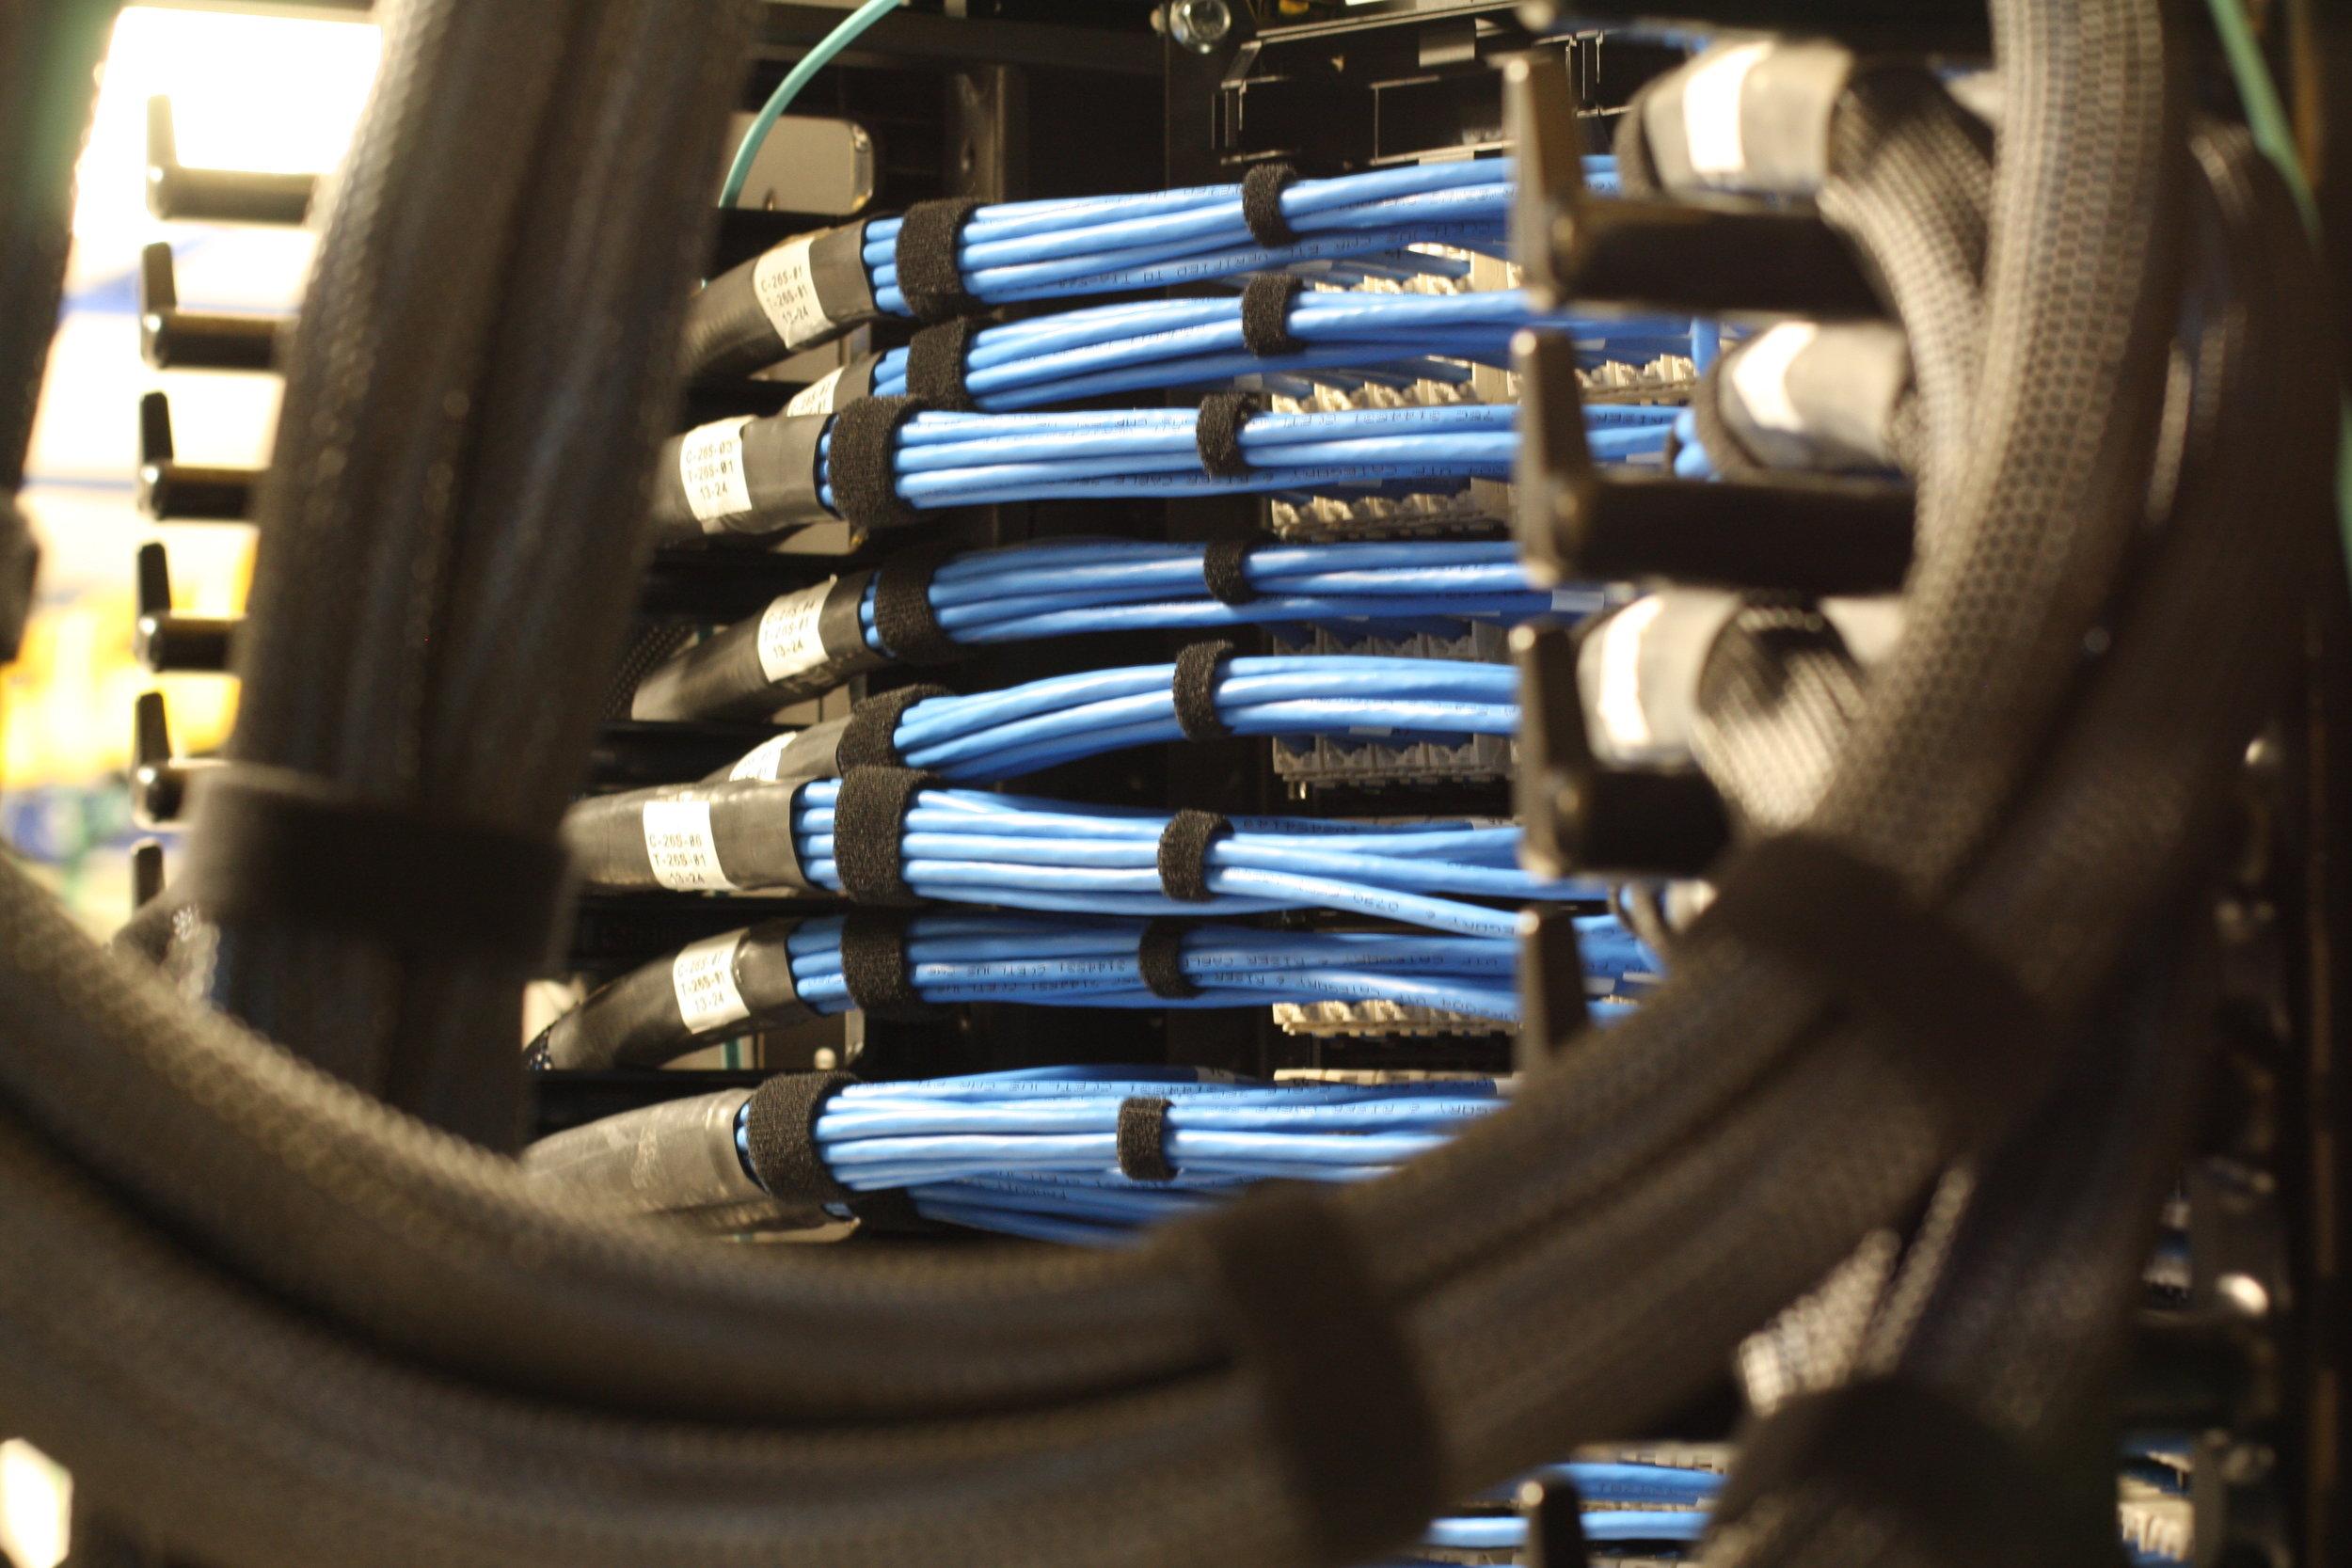 Chicago Data Center CH02.16.JPG